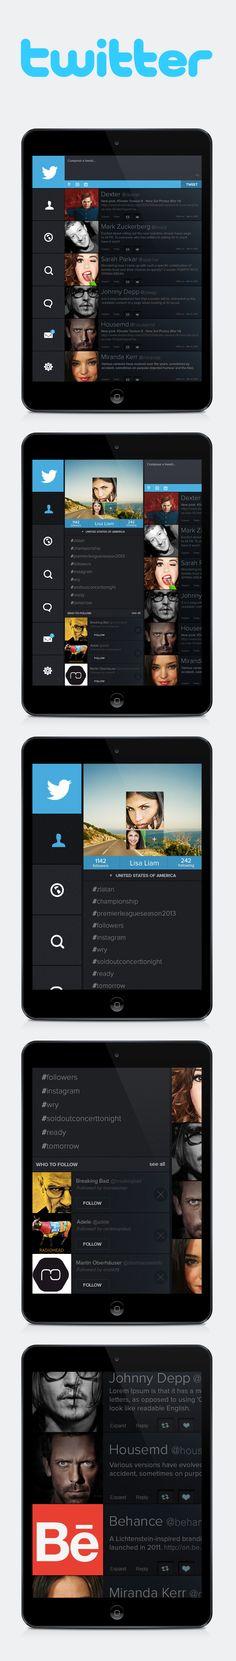 Twitter ipad edition (conception) by Enes Danis, via Behance Flat Web Design, Ui Ux Design, Tablet Ui, Iphone App Design, Mobile Web Design, App Design Inspiration, Ui Web, Application Design, Ipad App